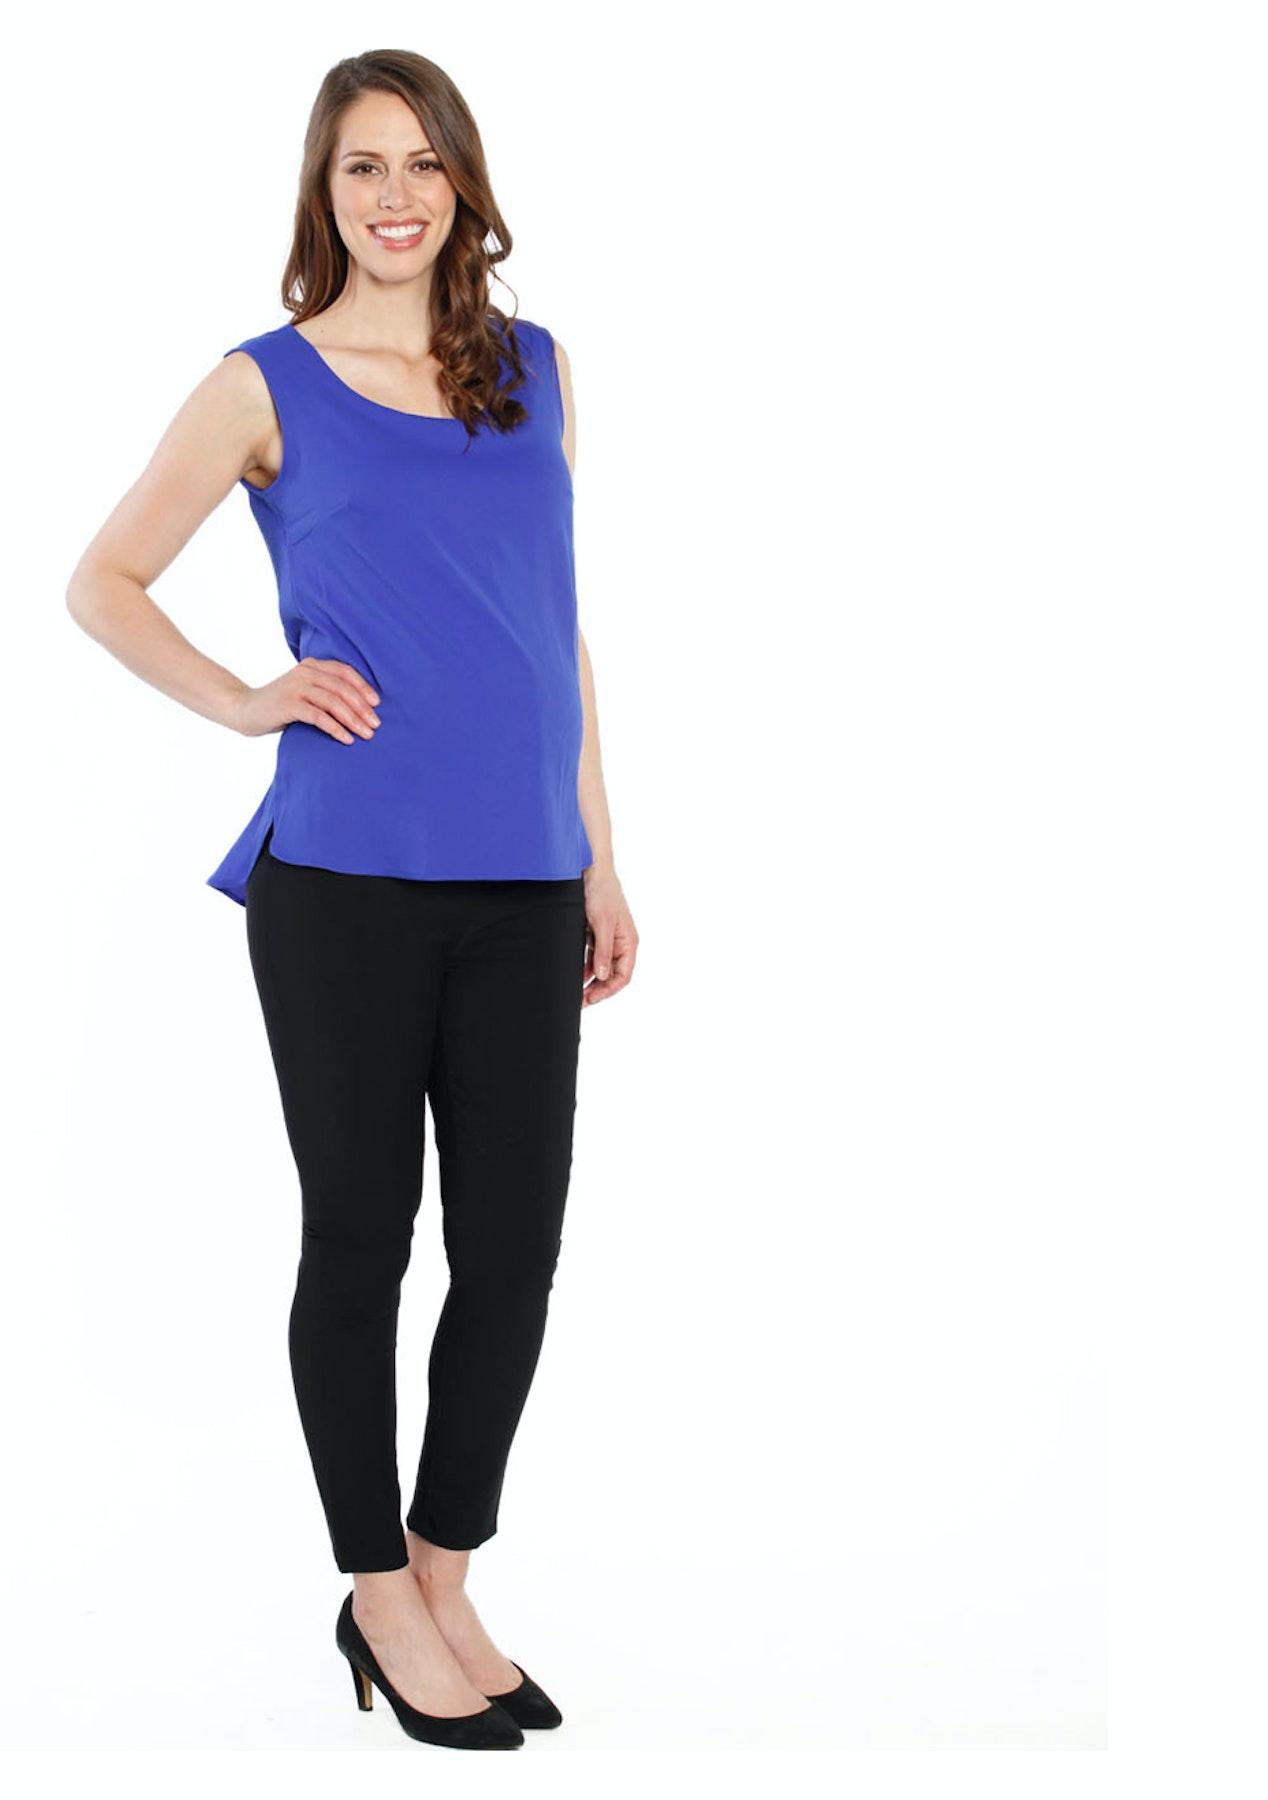 e648392e70dfe Angel Maternity - Breastfeeding Layered Chiffon Nursing Top - Cobalt Blue -  Love Your Bump - On Trend Maternity Wear - Onceit